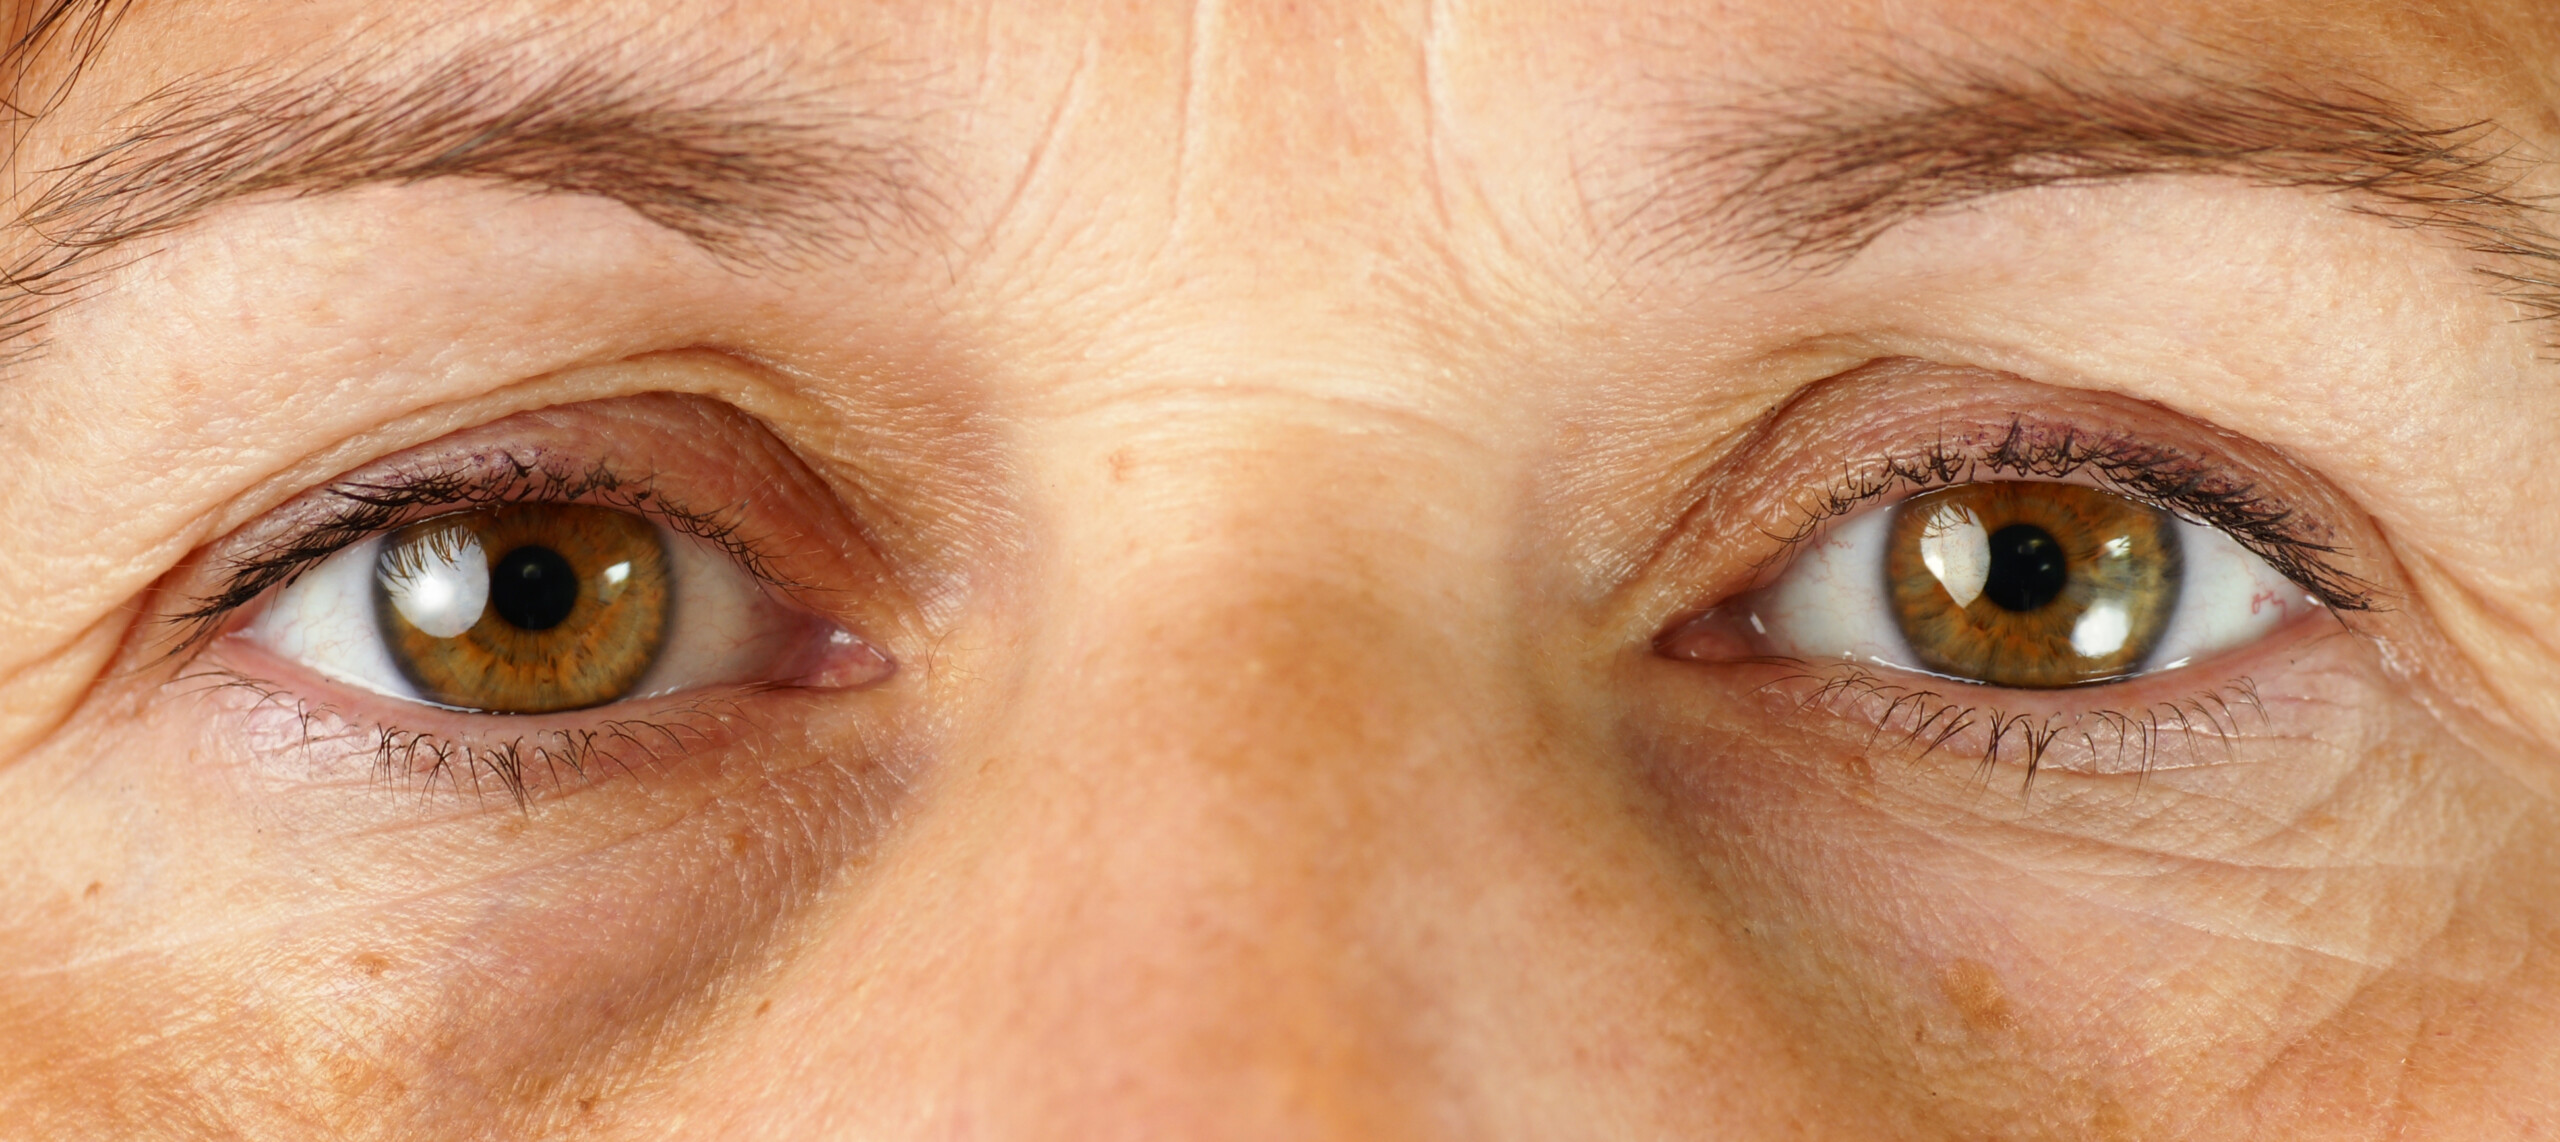 Under-Eye Wrinkles: Have Surgery; TCA Peel Won't Work